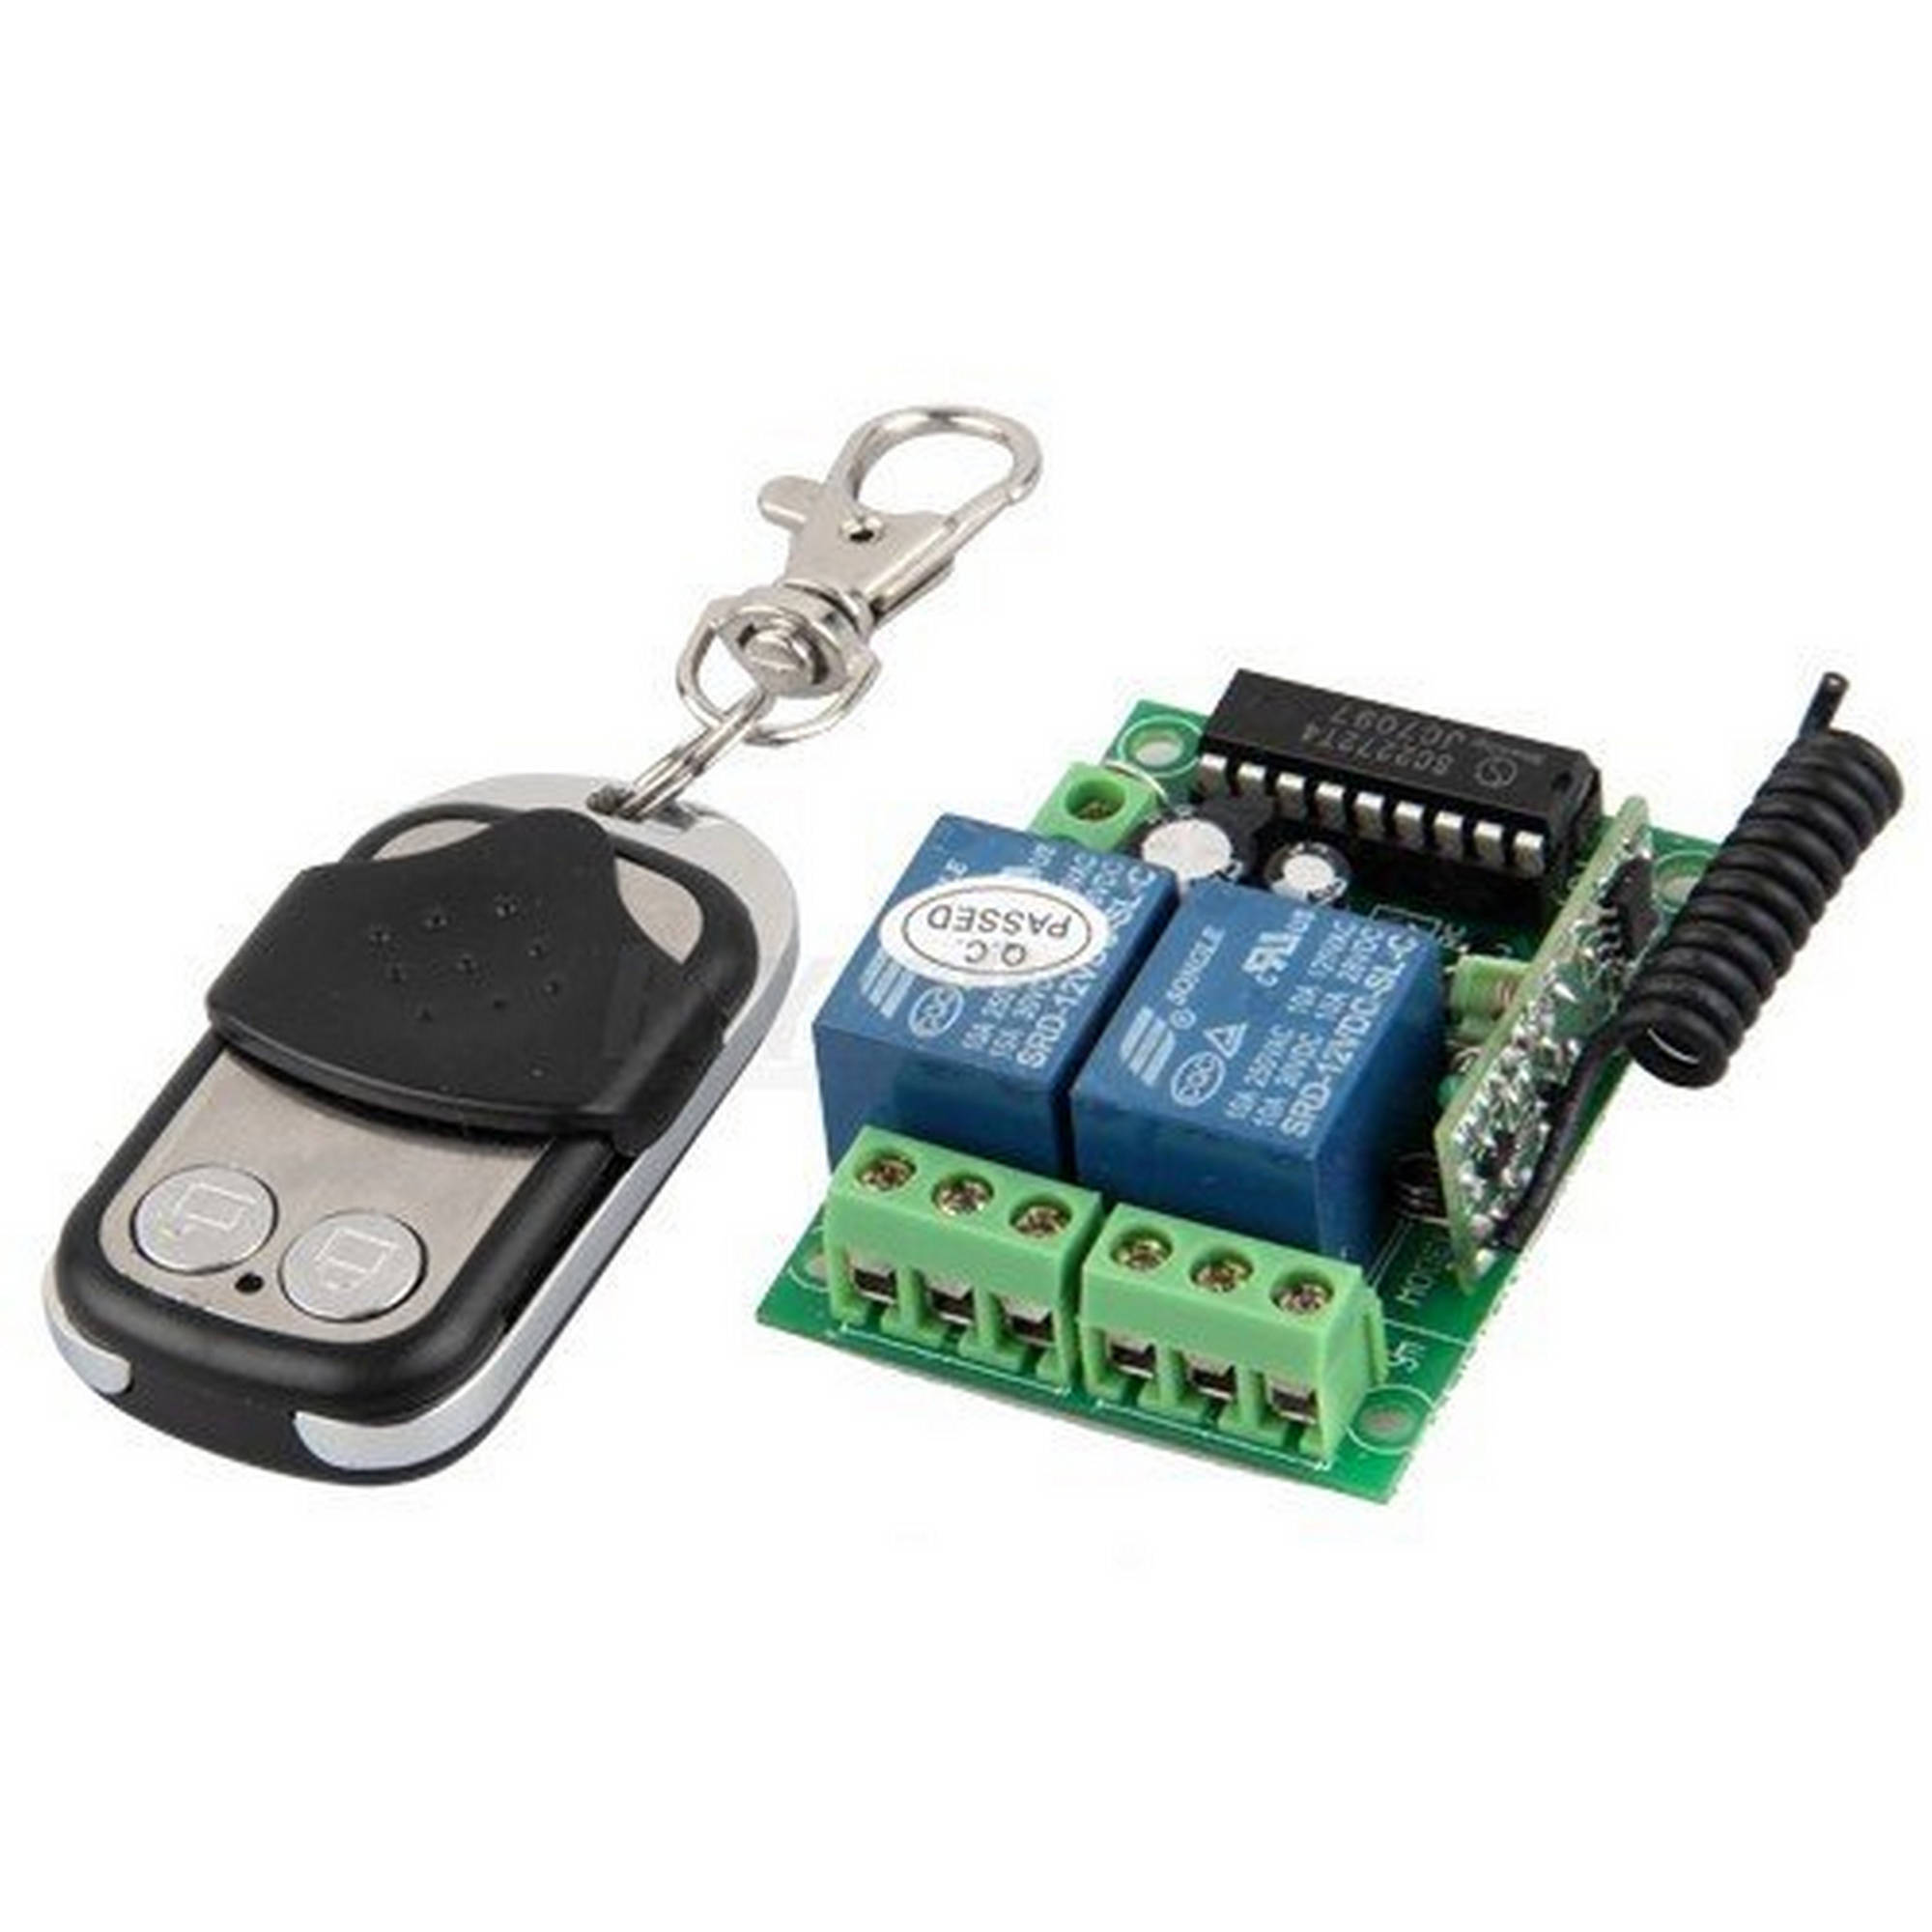 Aleko Remote Control Transmitter for Universal Gate Garage Door Opener Syk01